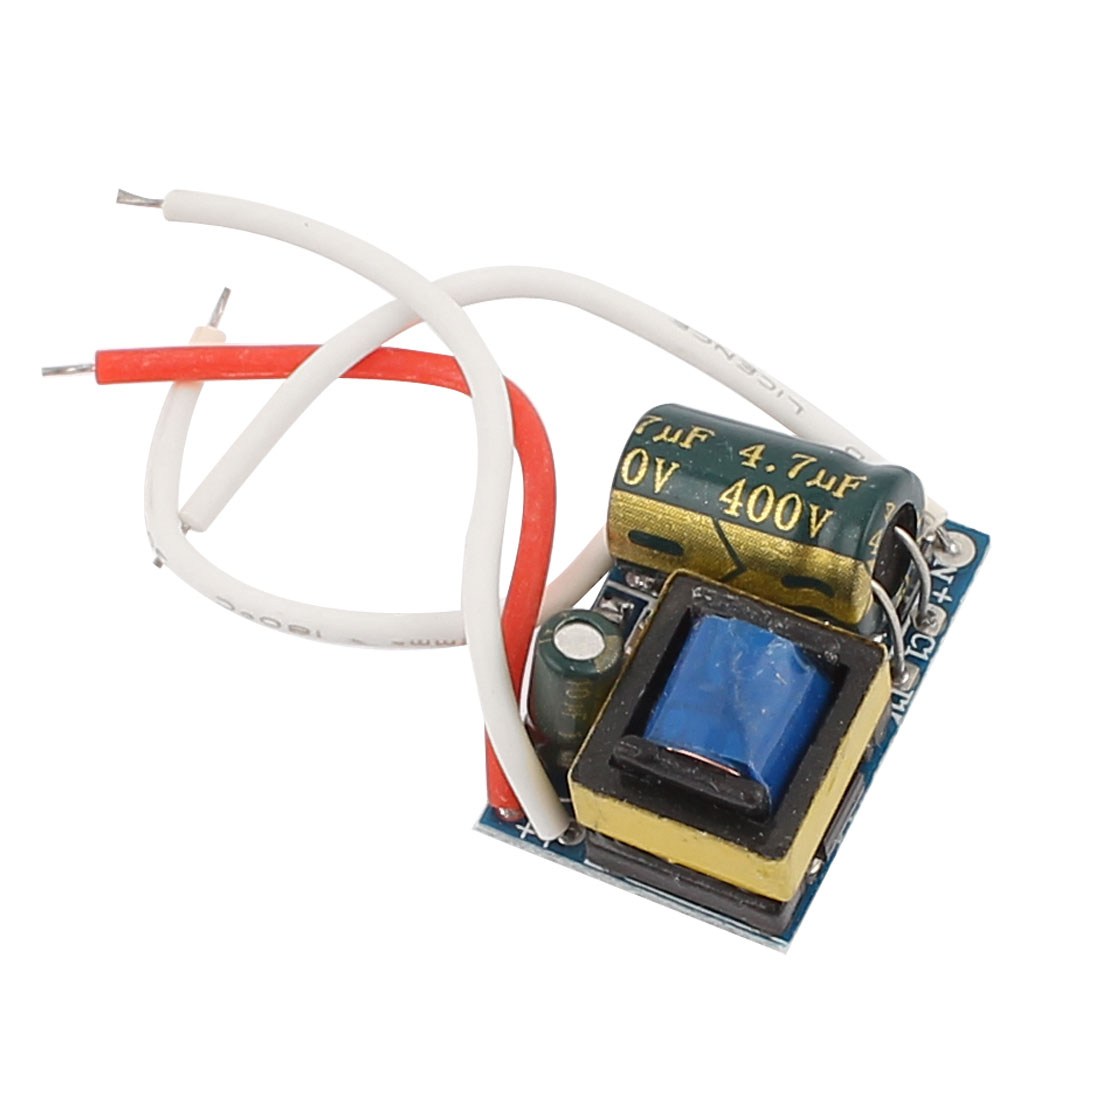 AC 85-265V DC 3-10V 300mA Power Supply Adapter for 1 X 3W LED Strip Light